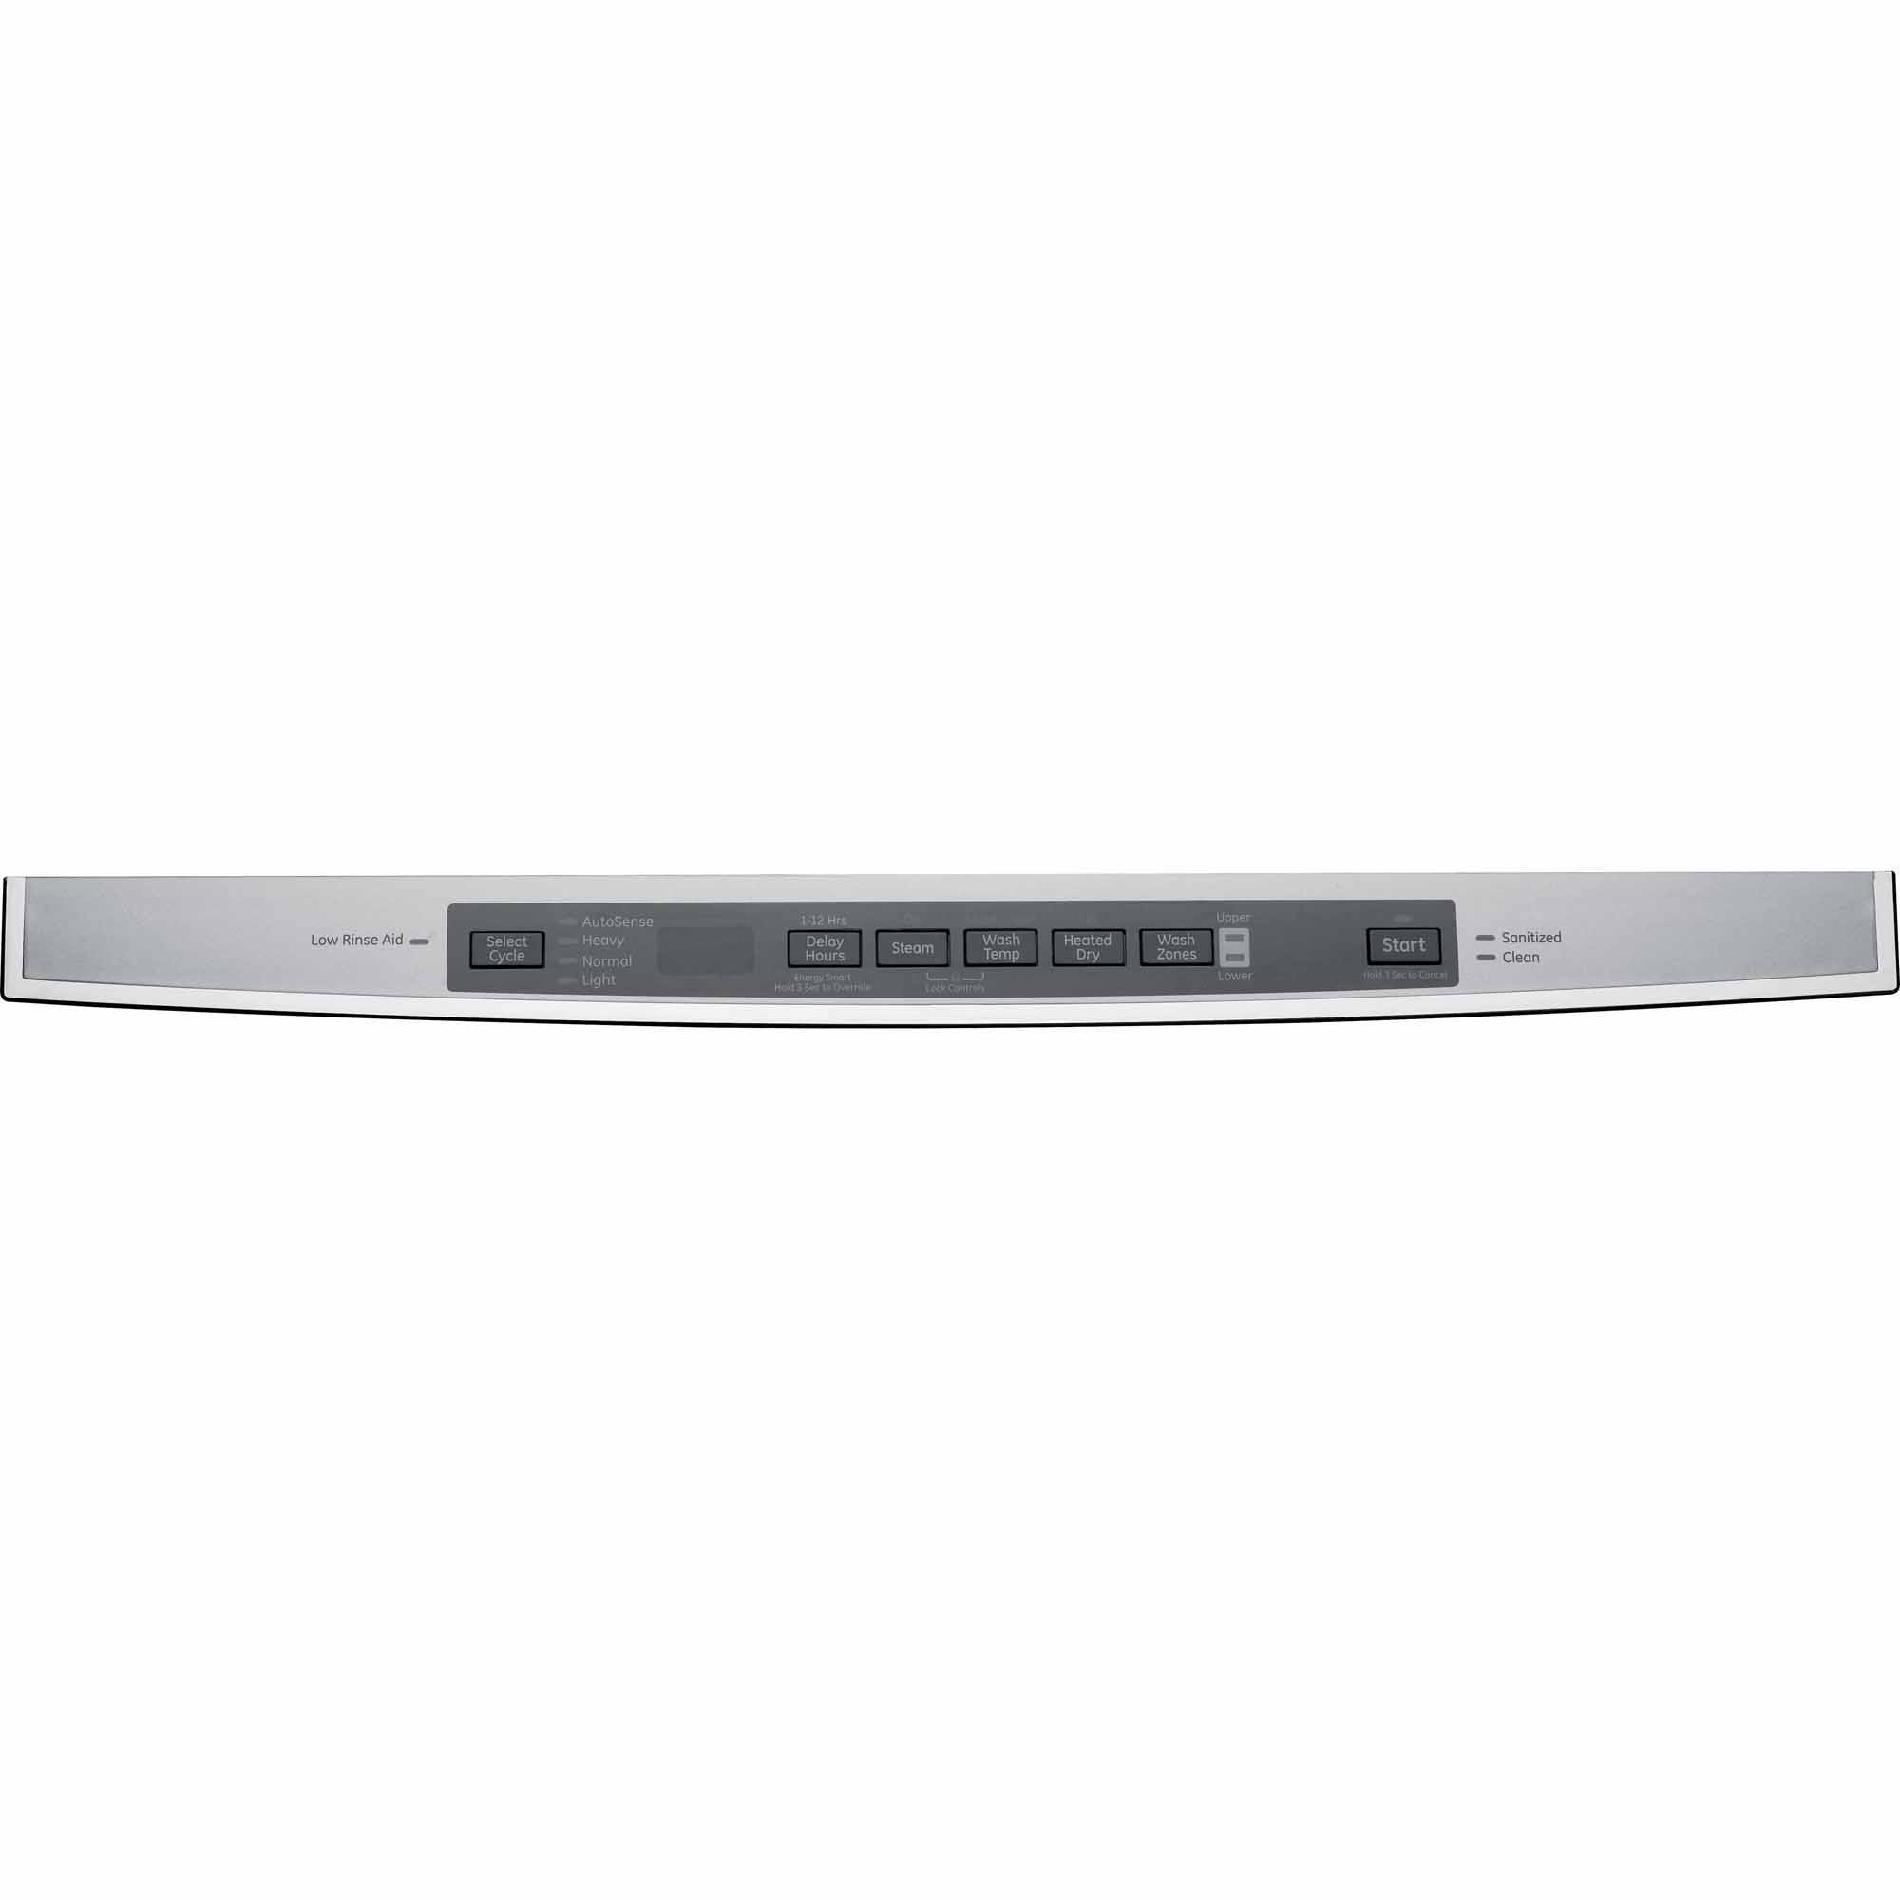 "GE 24"" Built-In Dishwasher w/ Hidden Controls - Stainless Steel"